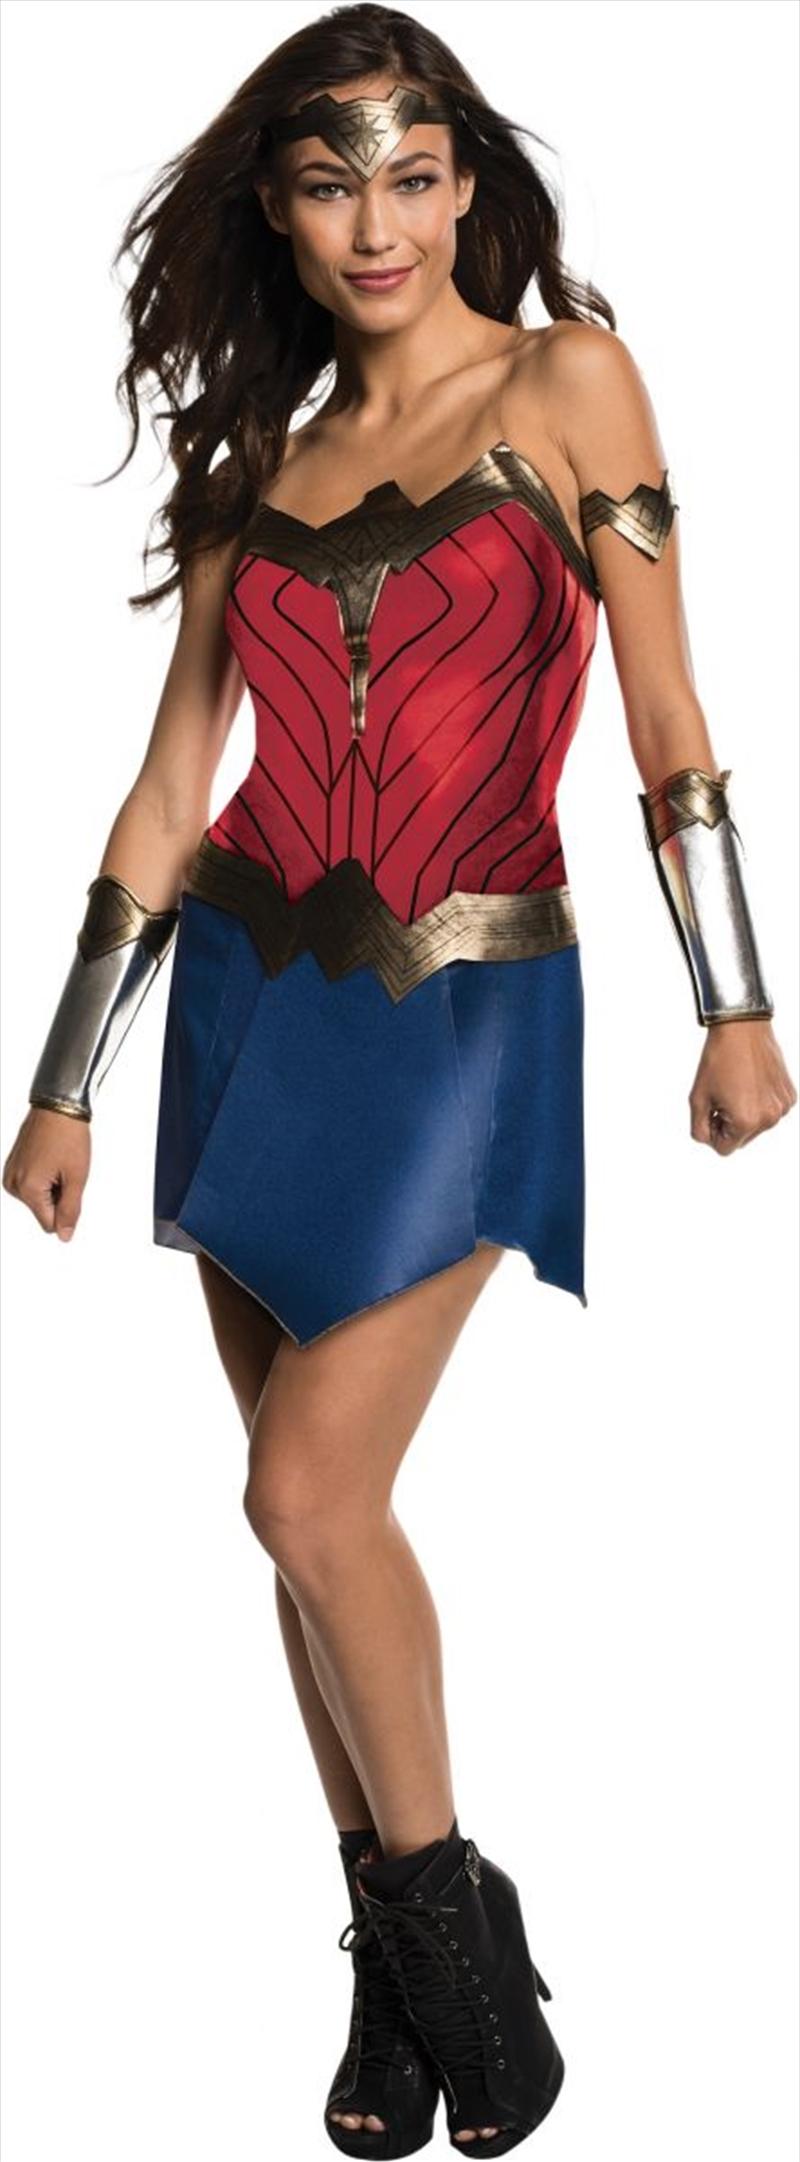 Wonder Woman Classic Costume (Small)   Apparel